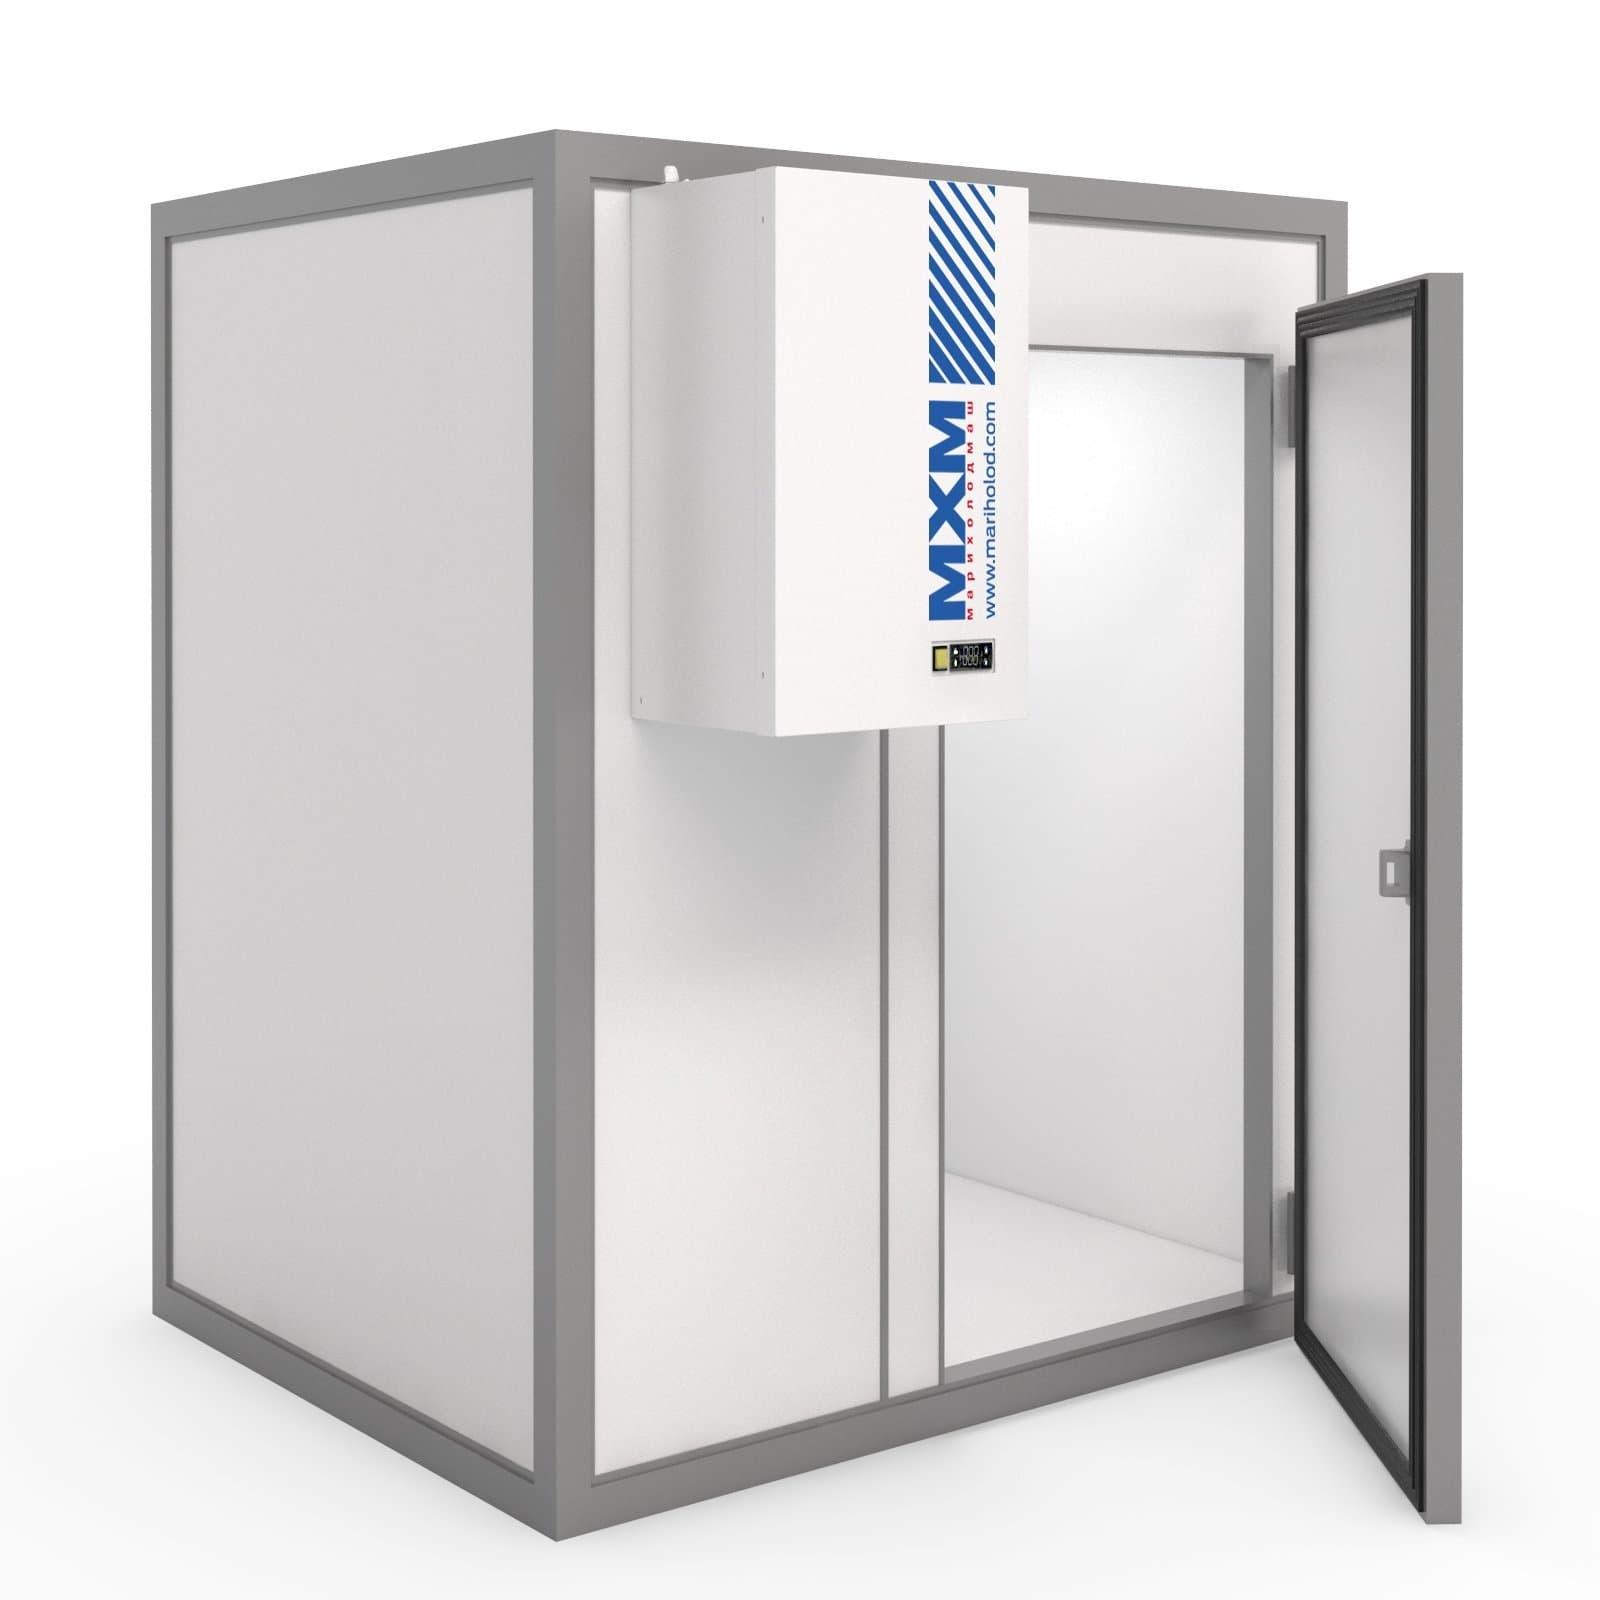 Камера холодильная МХМ КХН-29,03 2260×5560×2720